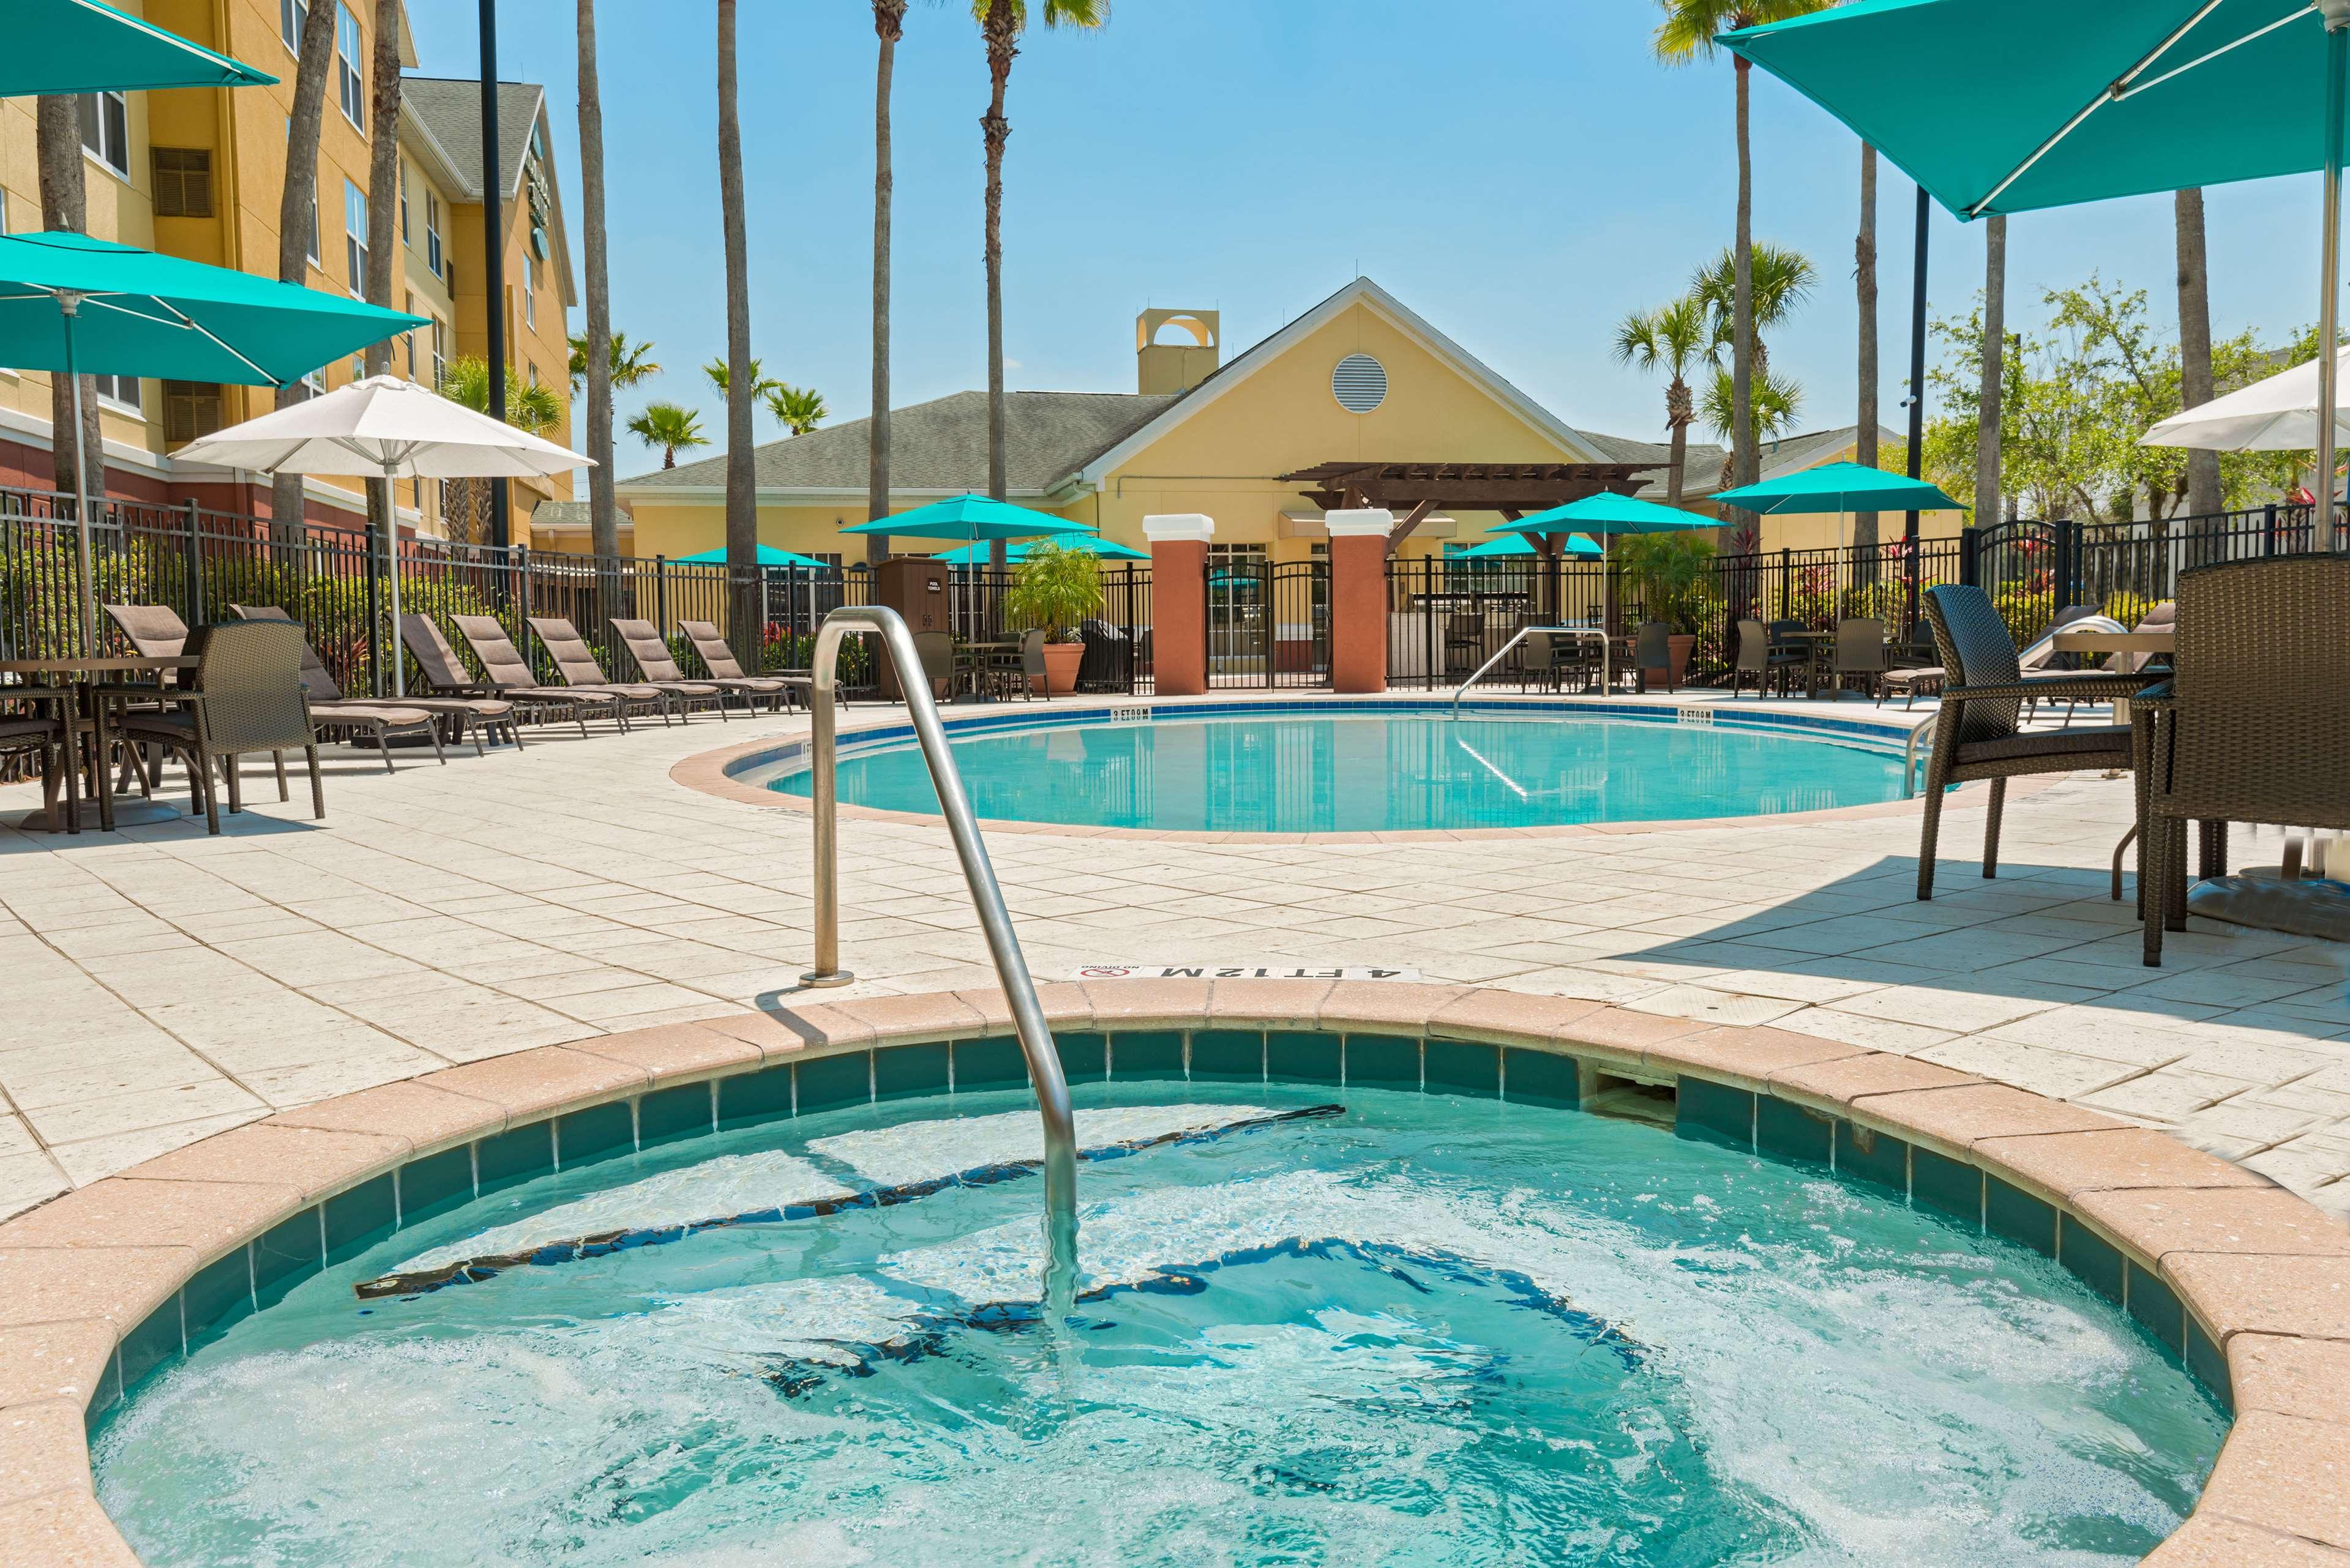 Homewood Suites by Hilton Orlando-UCF Area image 31